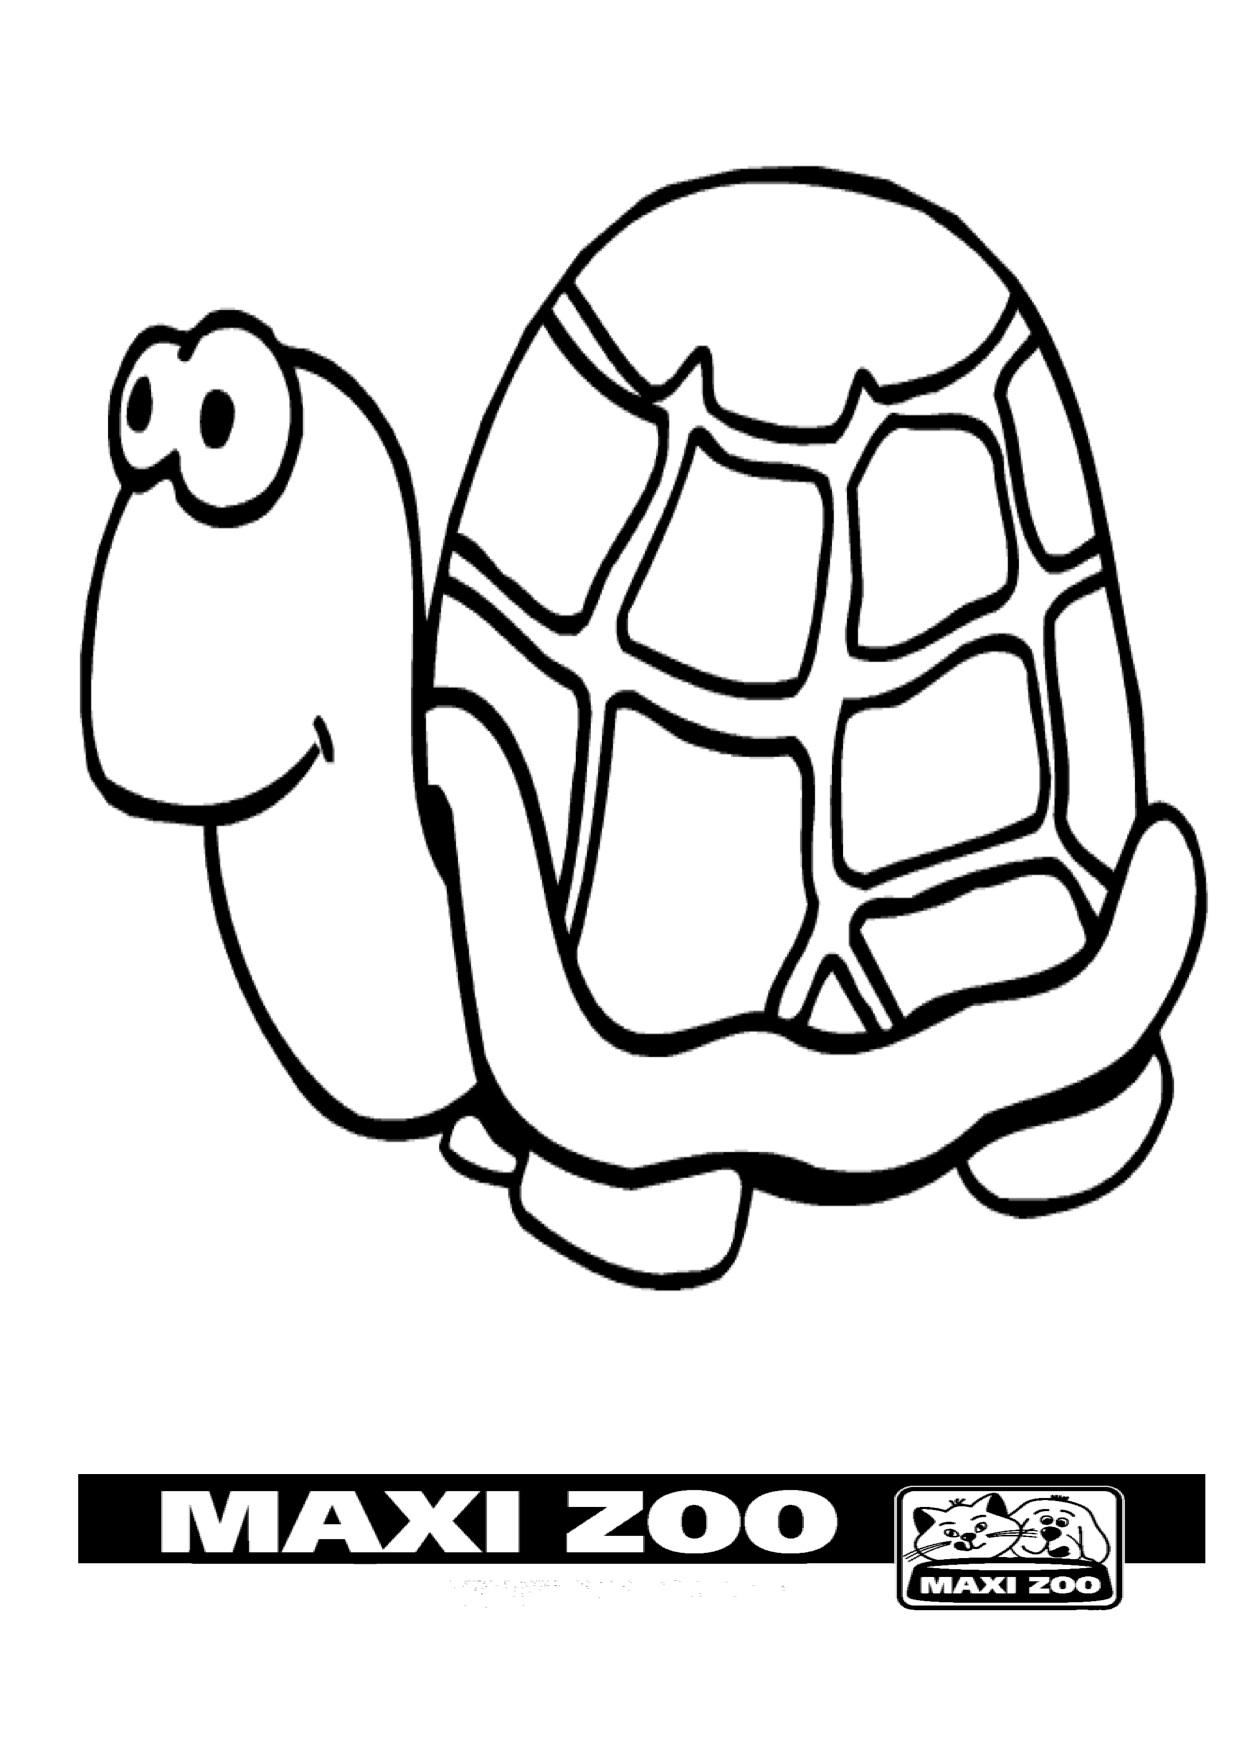 tortoise pictures to colour fashionable tortoise pictures to colour 9 printable to tortoise pictures colour